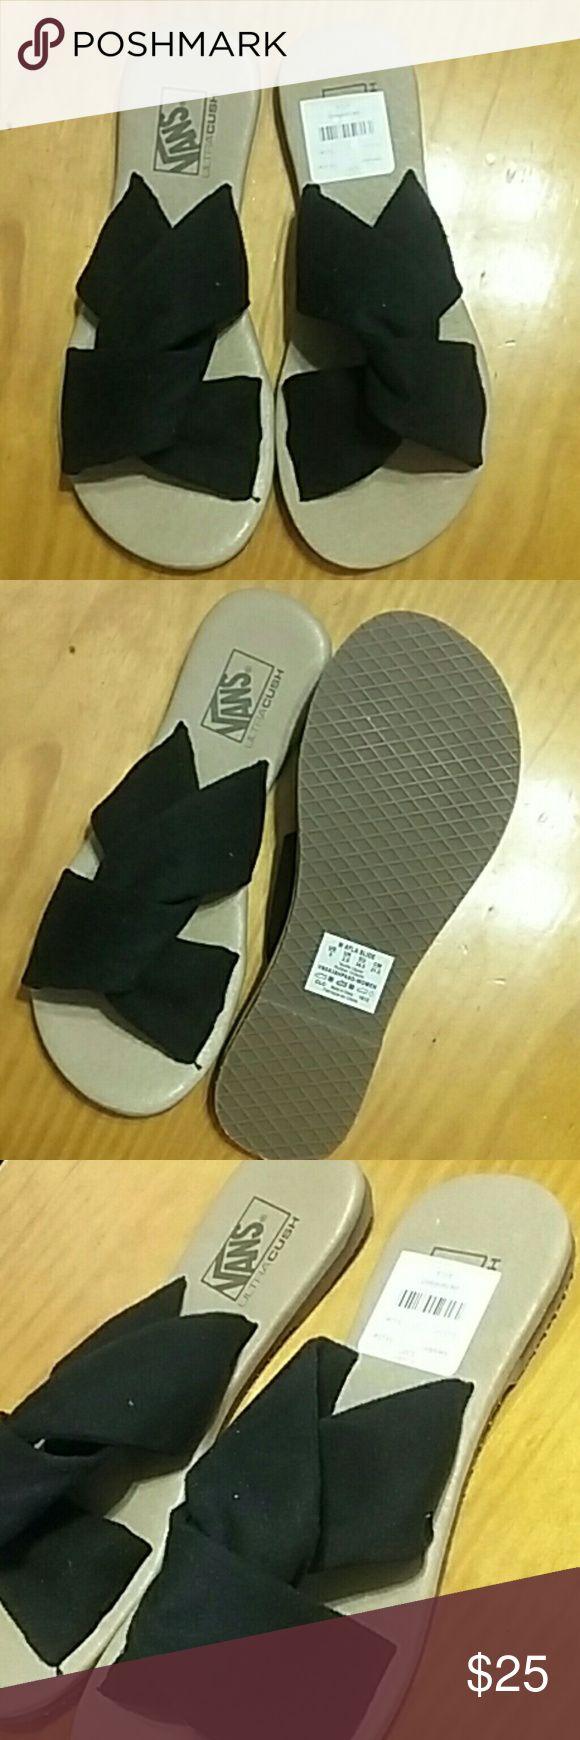 VANS Black Suede Slides Womans VANS #offthewall Ayla Black Suede Slide Twist Design. Size 5 Brand New/Never Worn Box is damaged. Will send if you would like it. Price is FIRM. Bundle & Save Vans Shoes Sandals